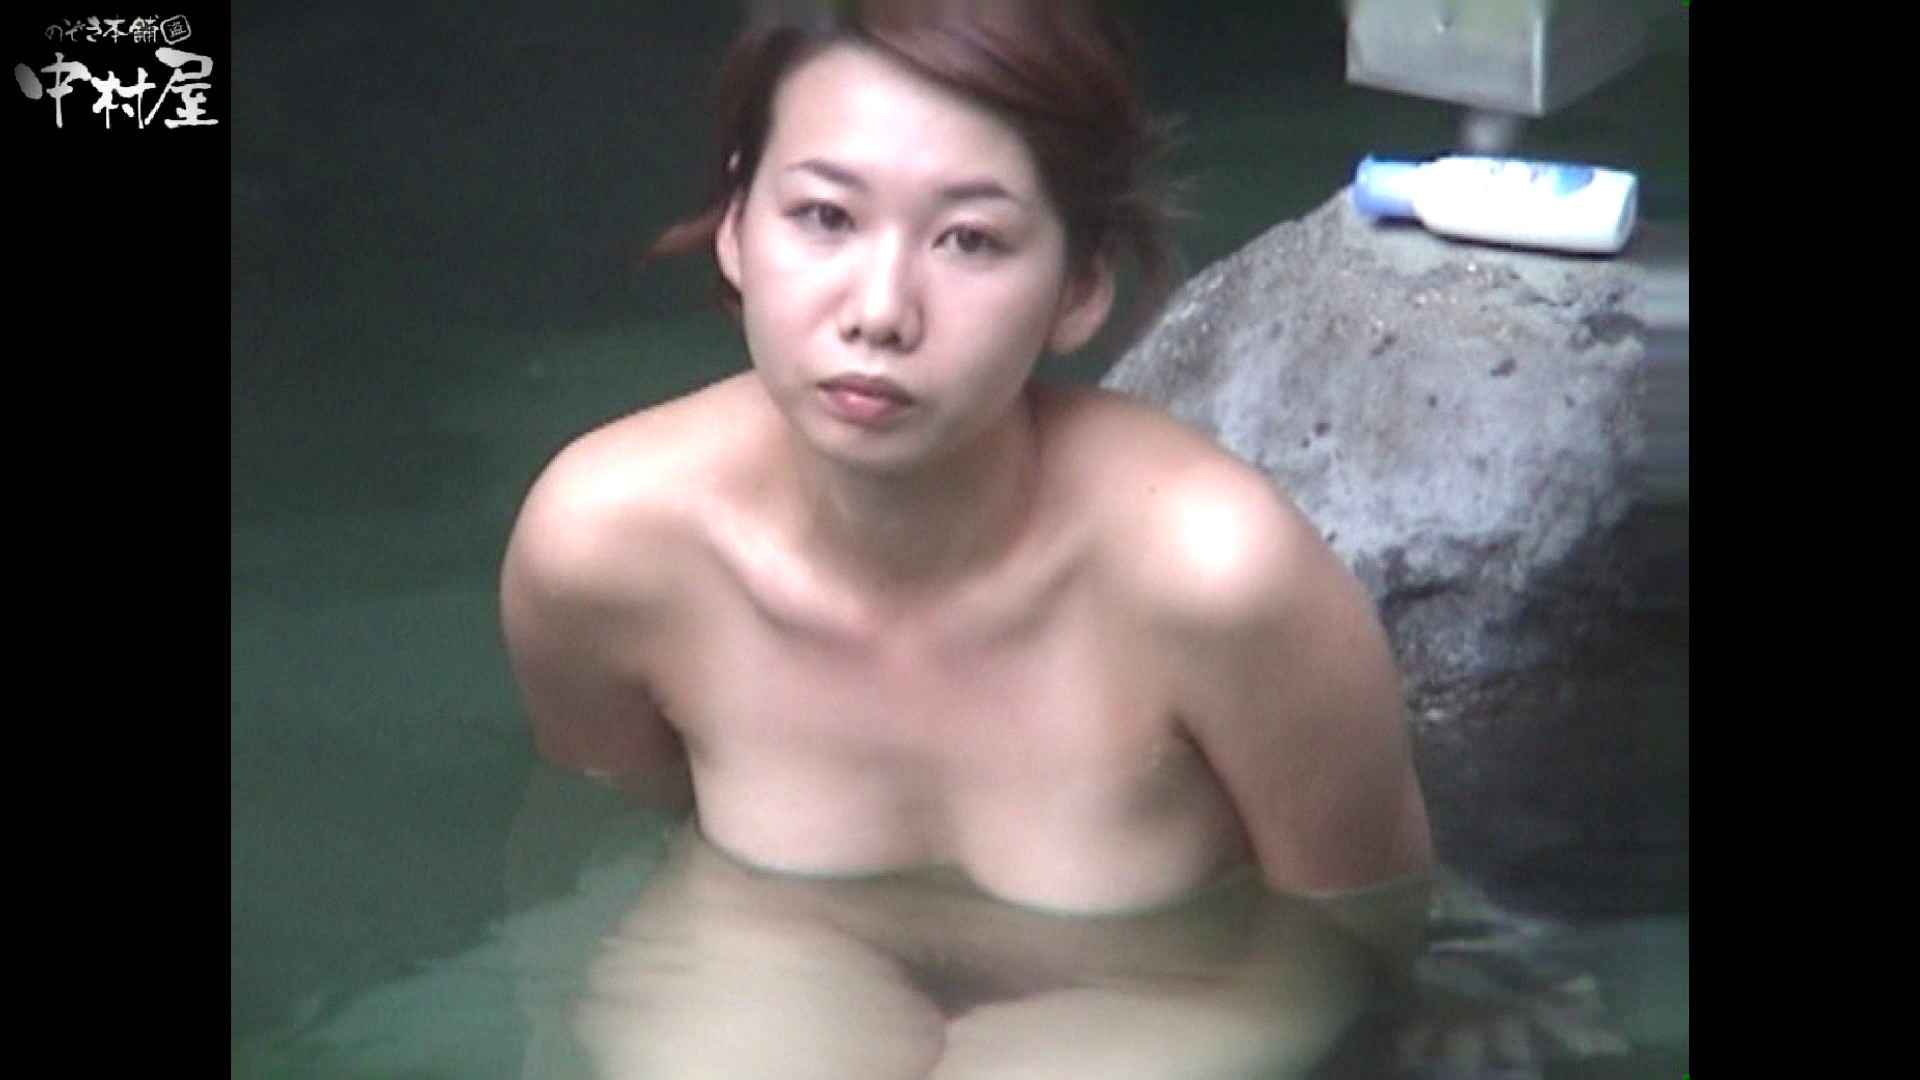 Aquaな露天風呂Vol.951 盗撮映像  93Pix 55